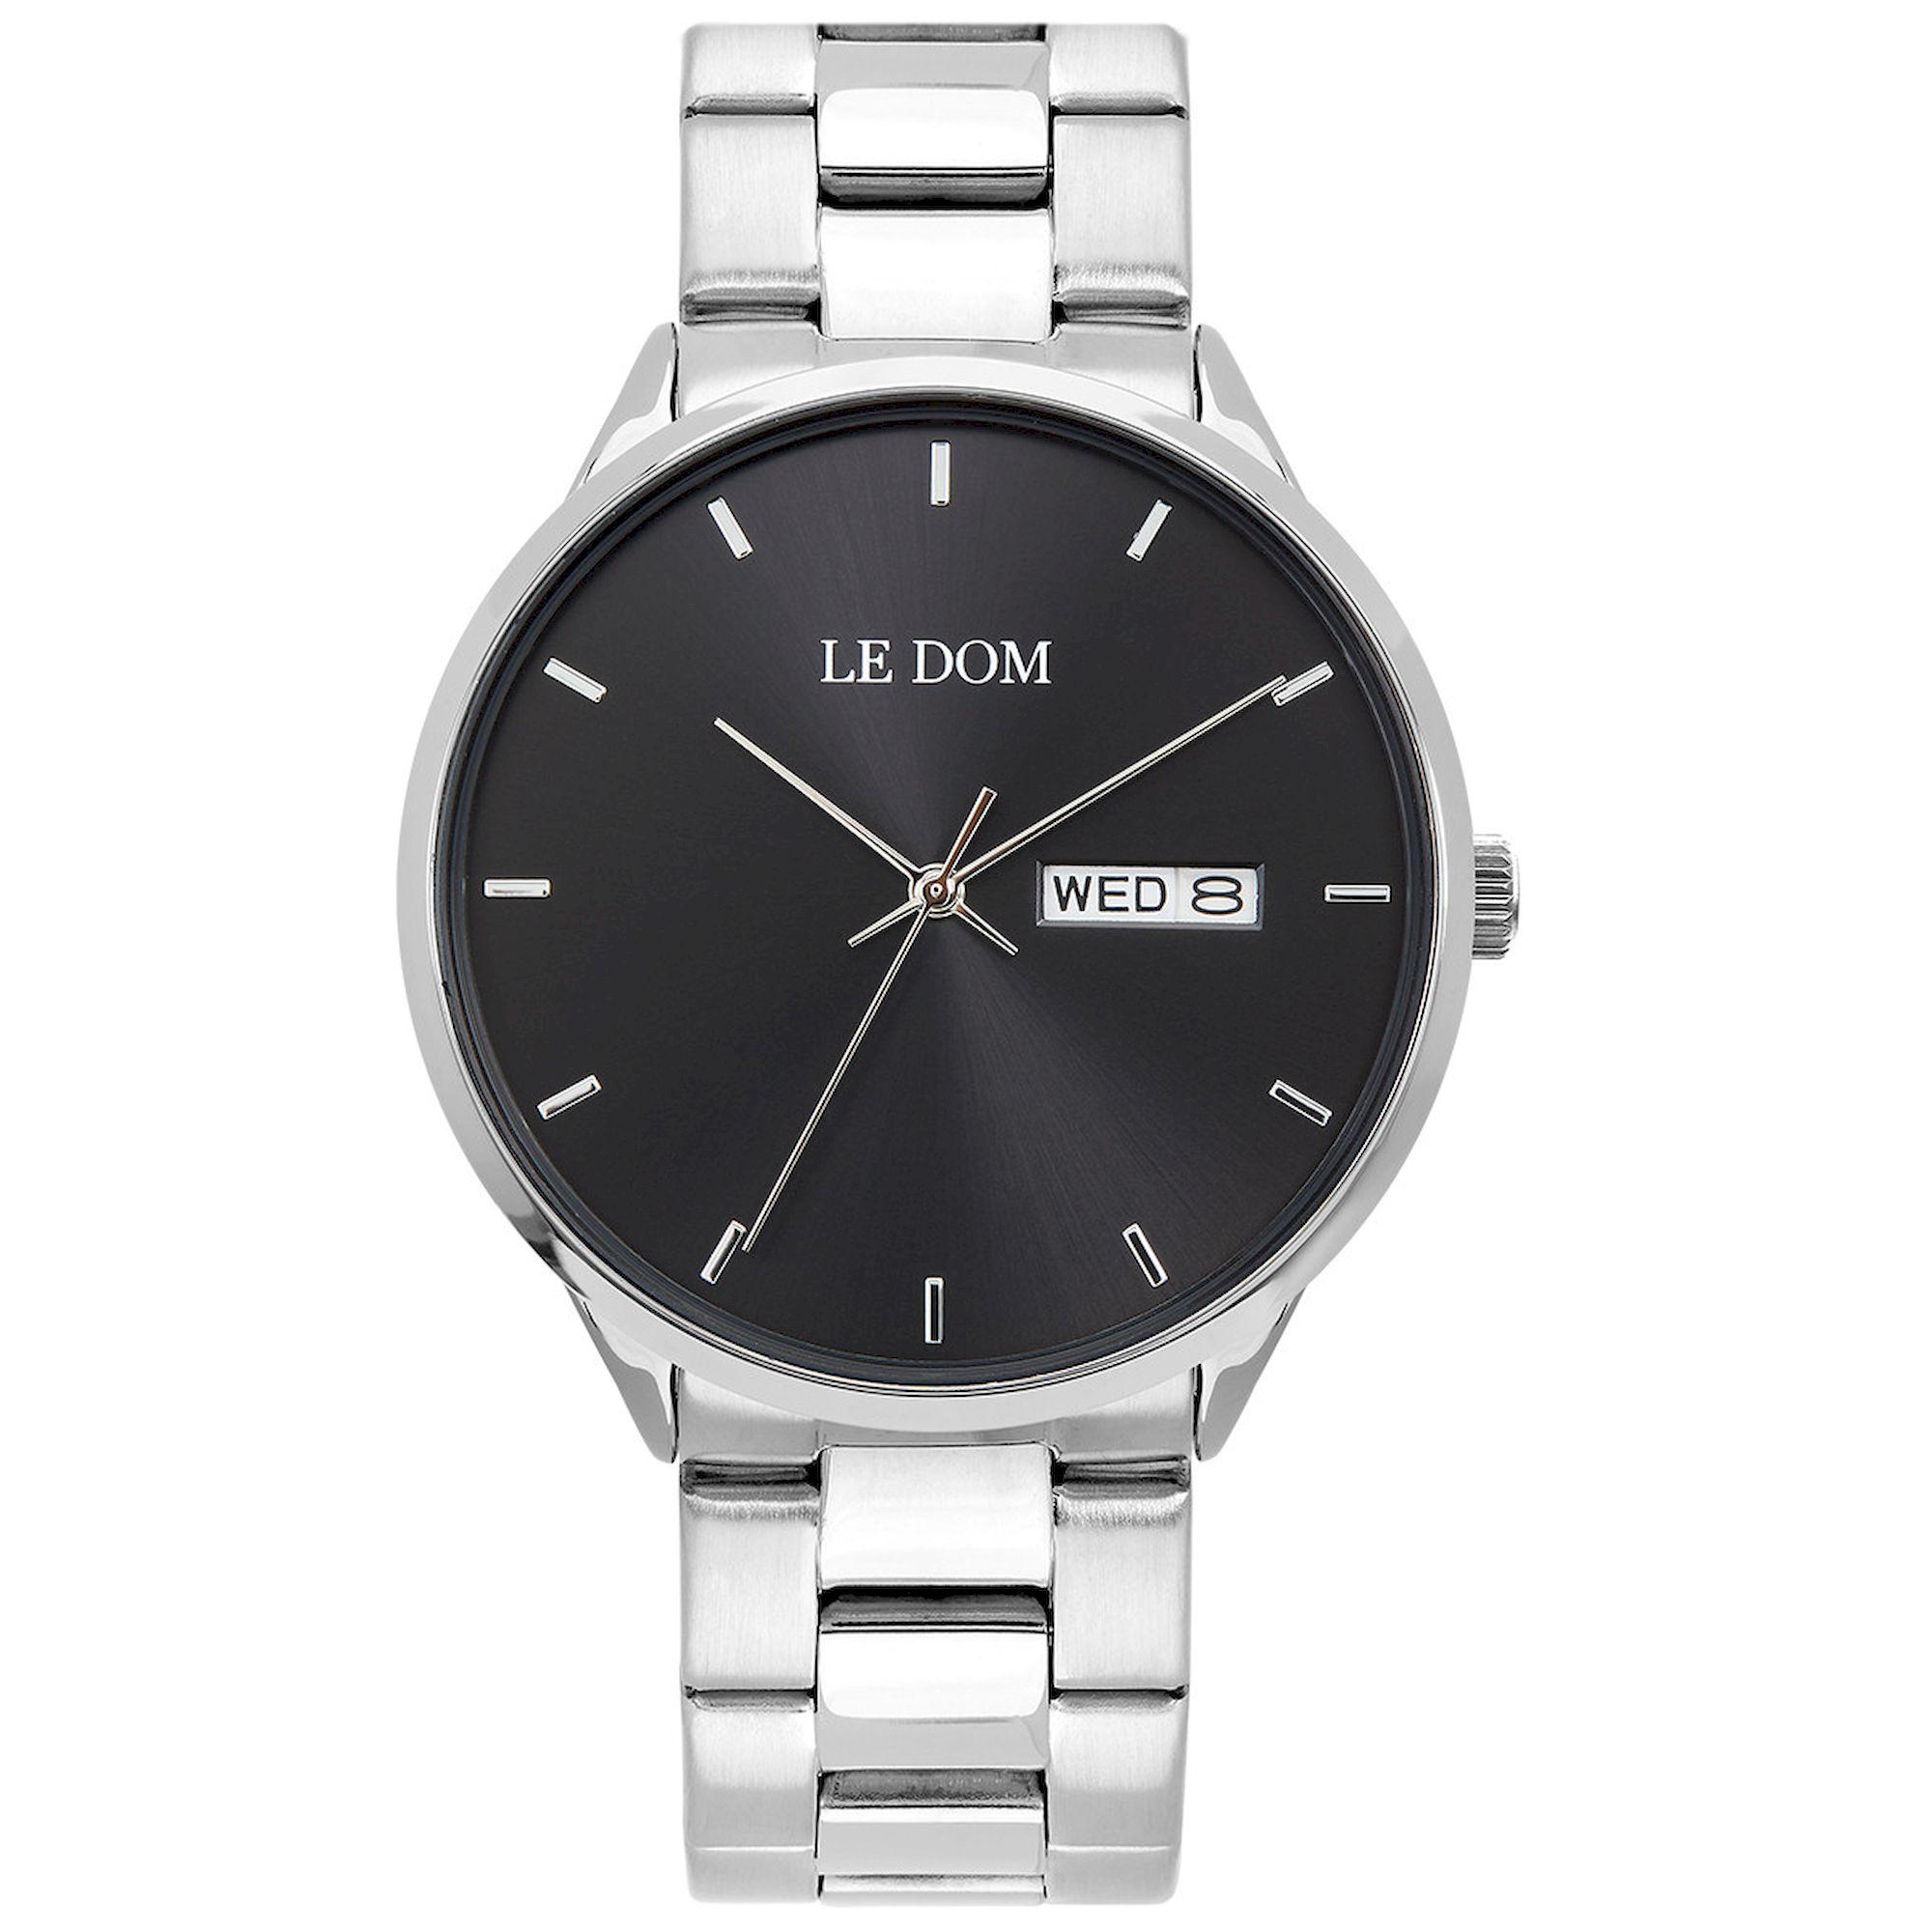 LE DOM Maxim Μαύρο Καντράν LD.1435-7, le dom, ανδρικό ρολόι, ρολόγια, Δωρεάν έξοδα αποστολής, Άμεση ΔΙαθεσιμότητα, Le Dom Ρολόγια